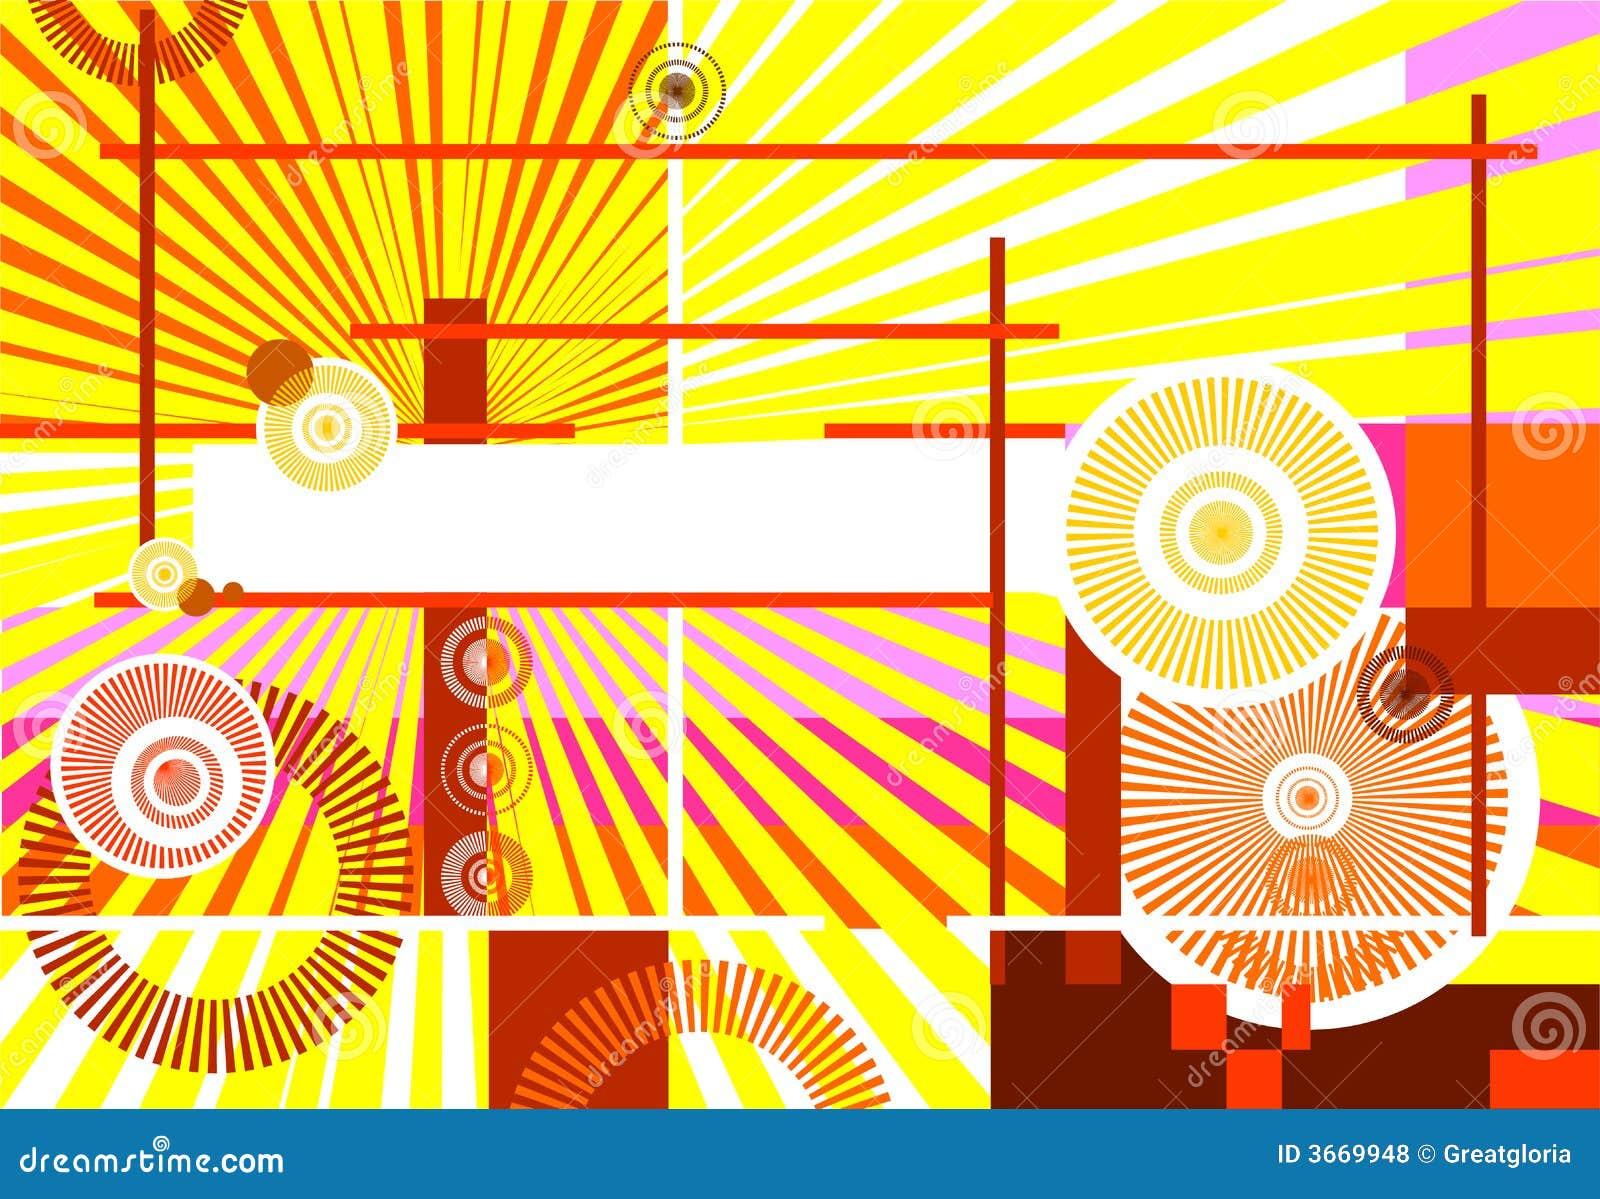 Projekt abstrakcyjne tło